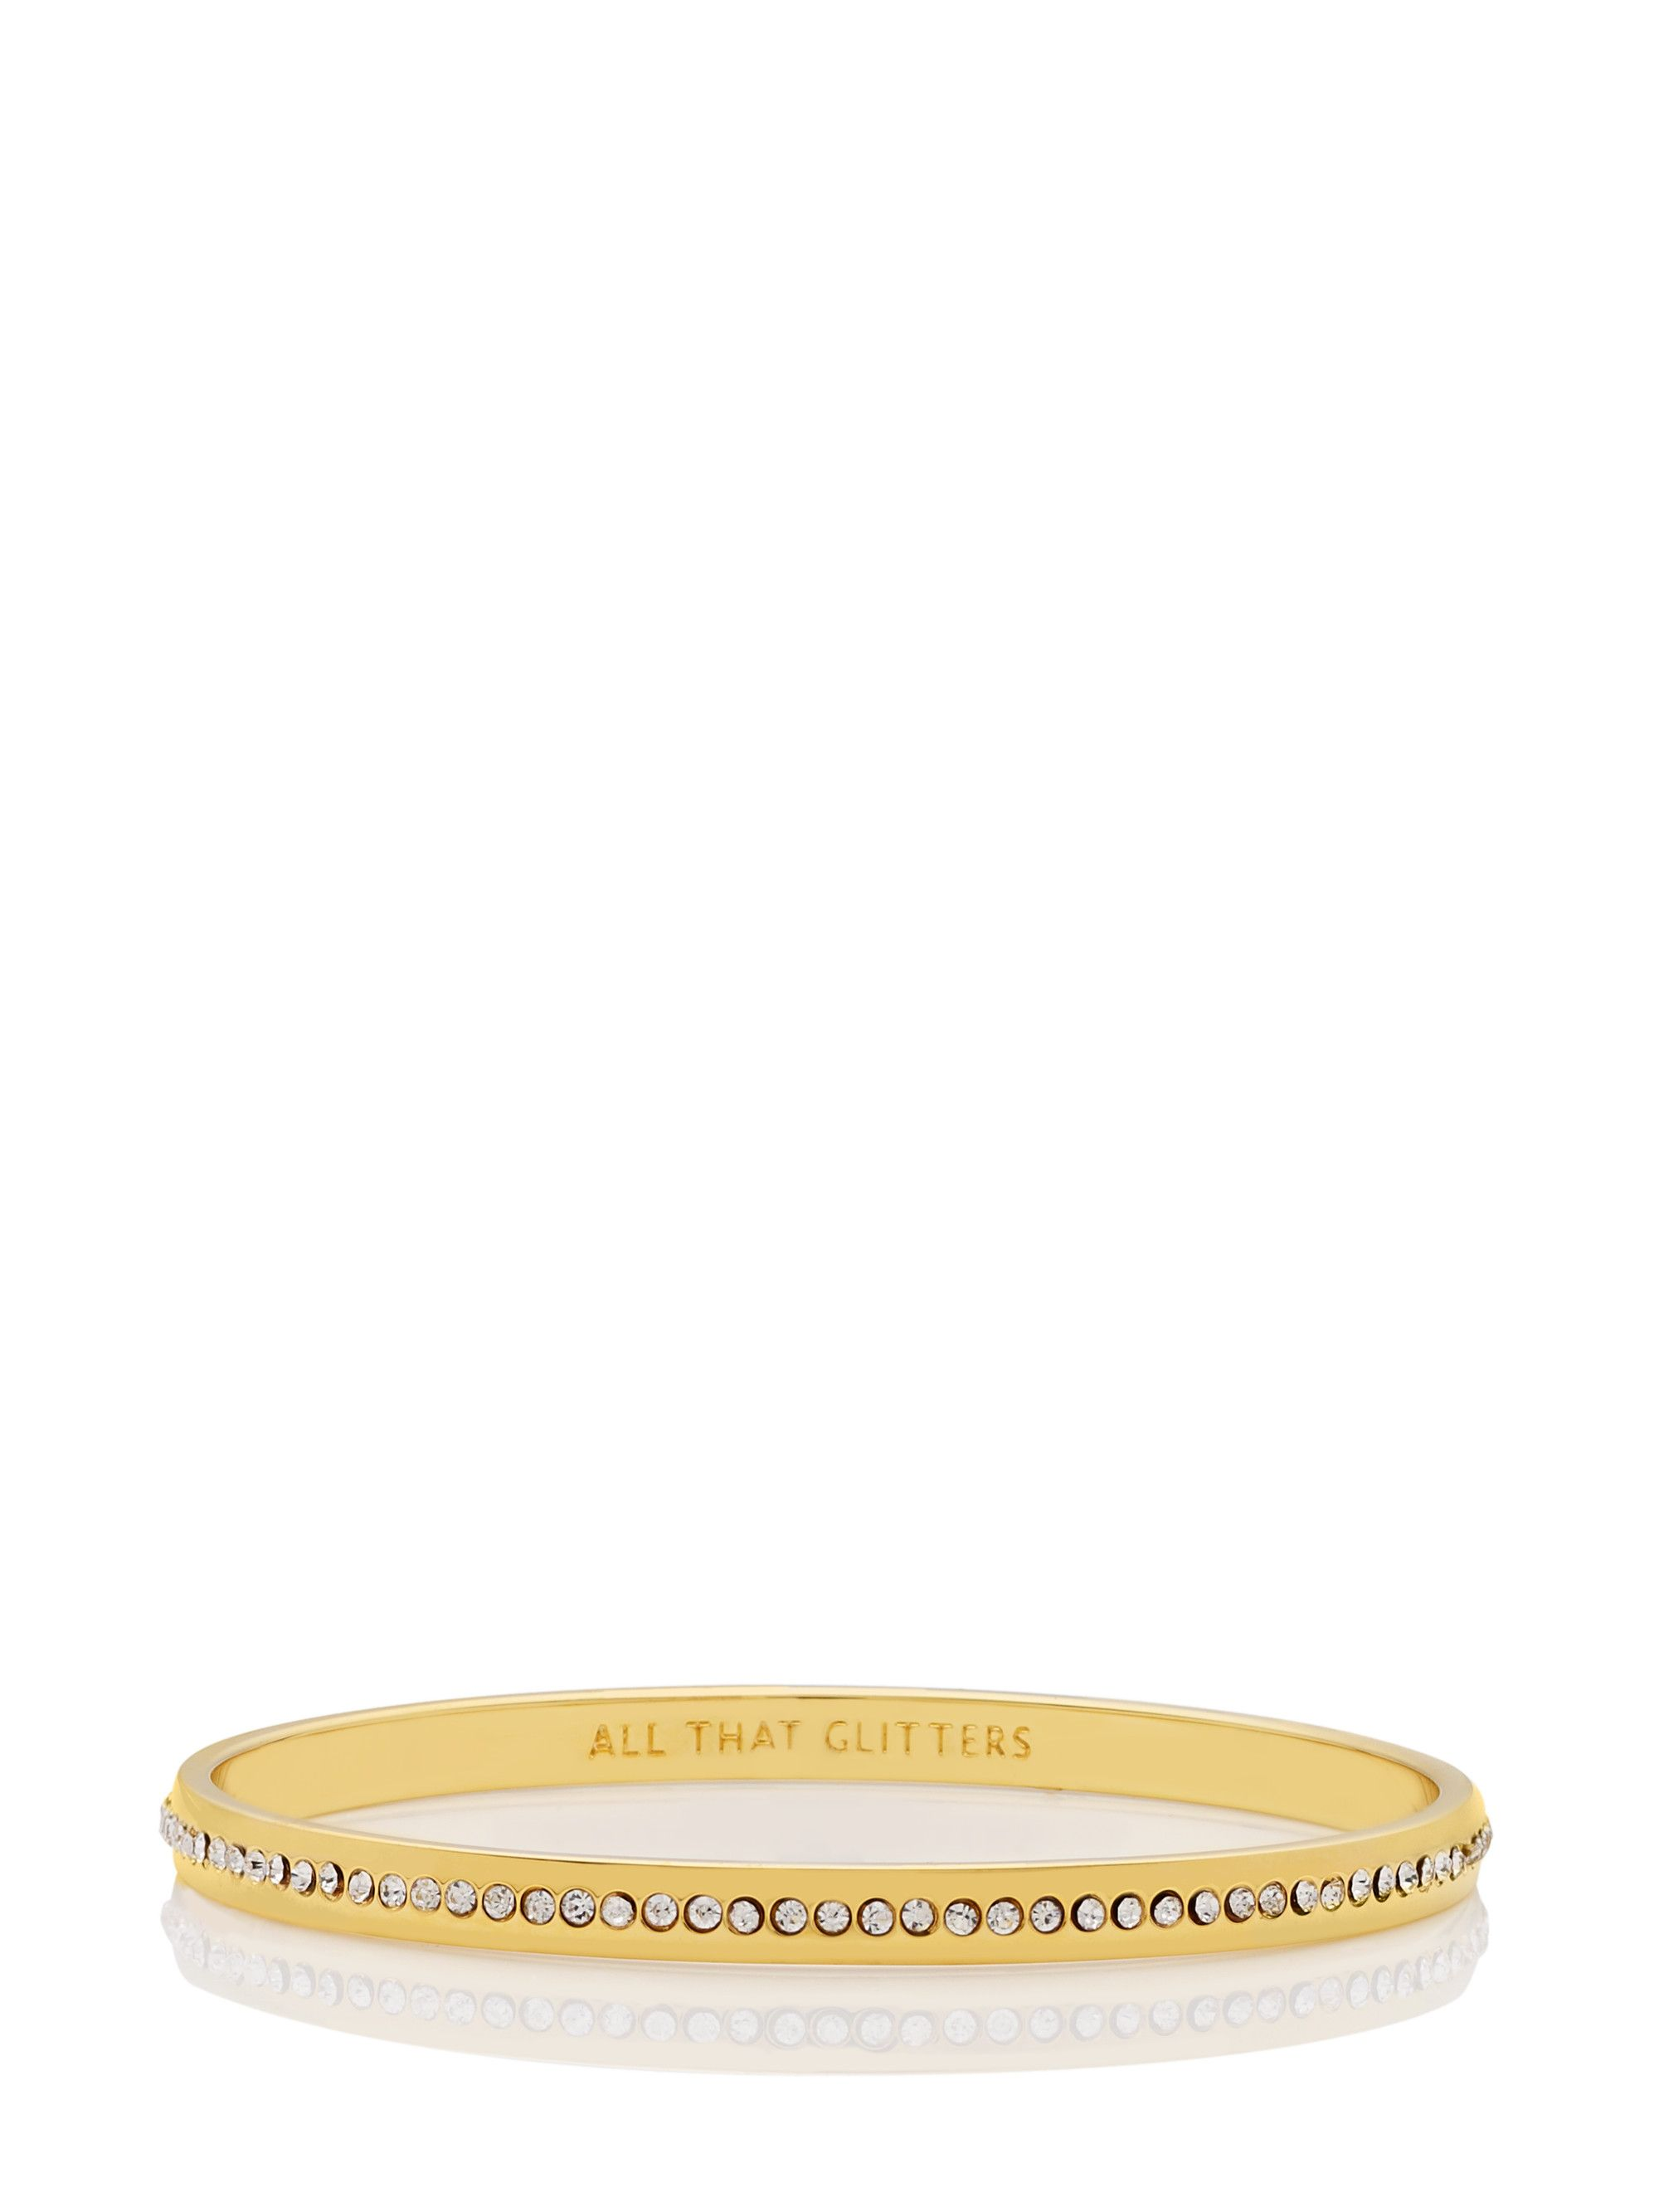 pearls of wisdom idiom bangle   Bangles, Jewelry, Best